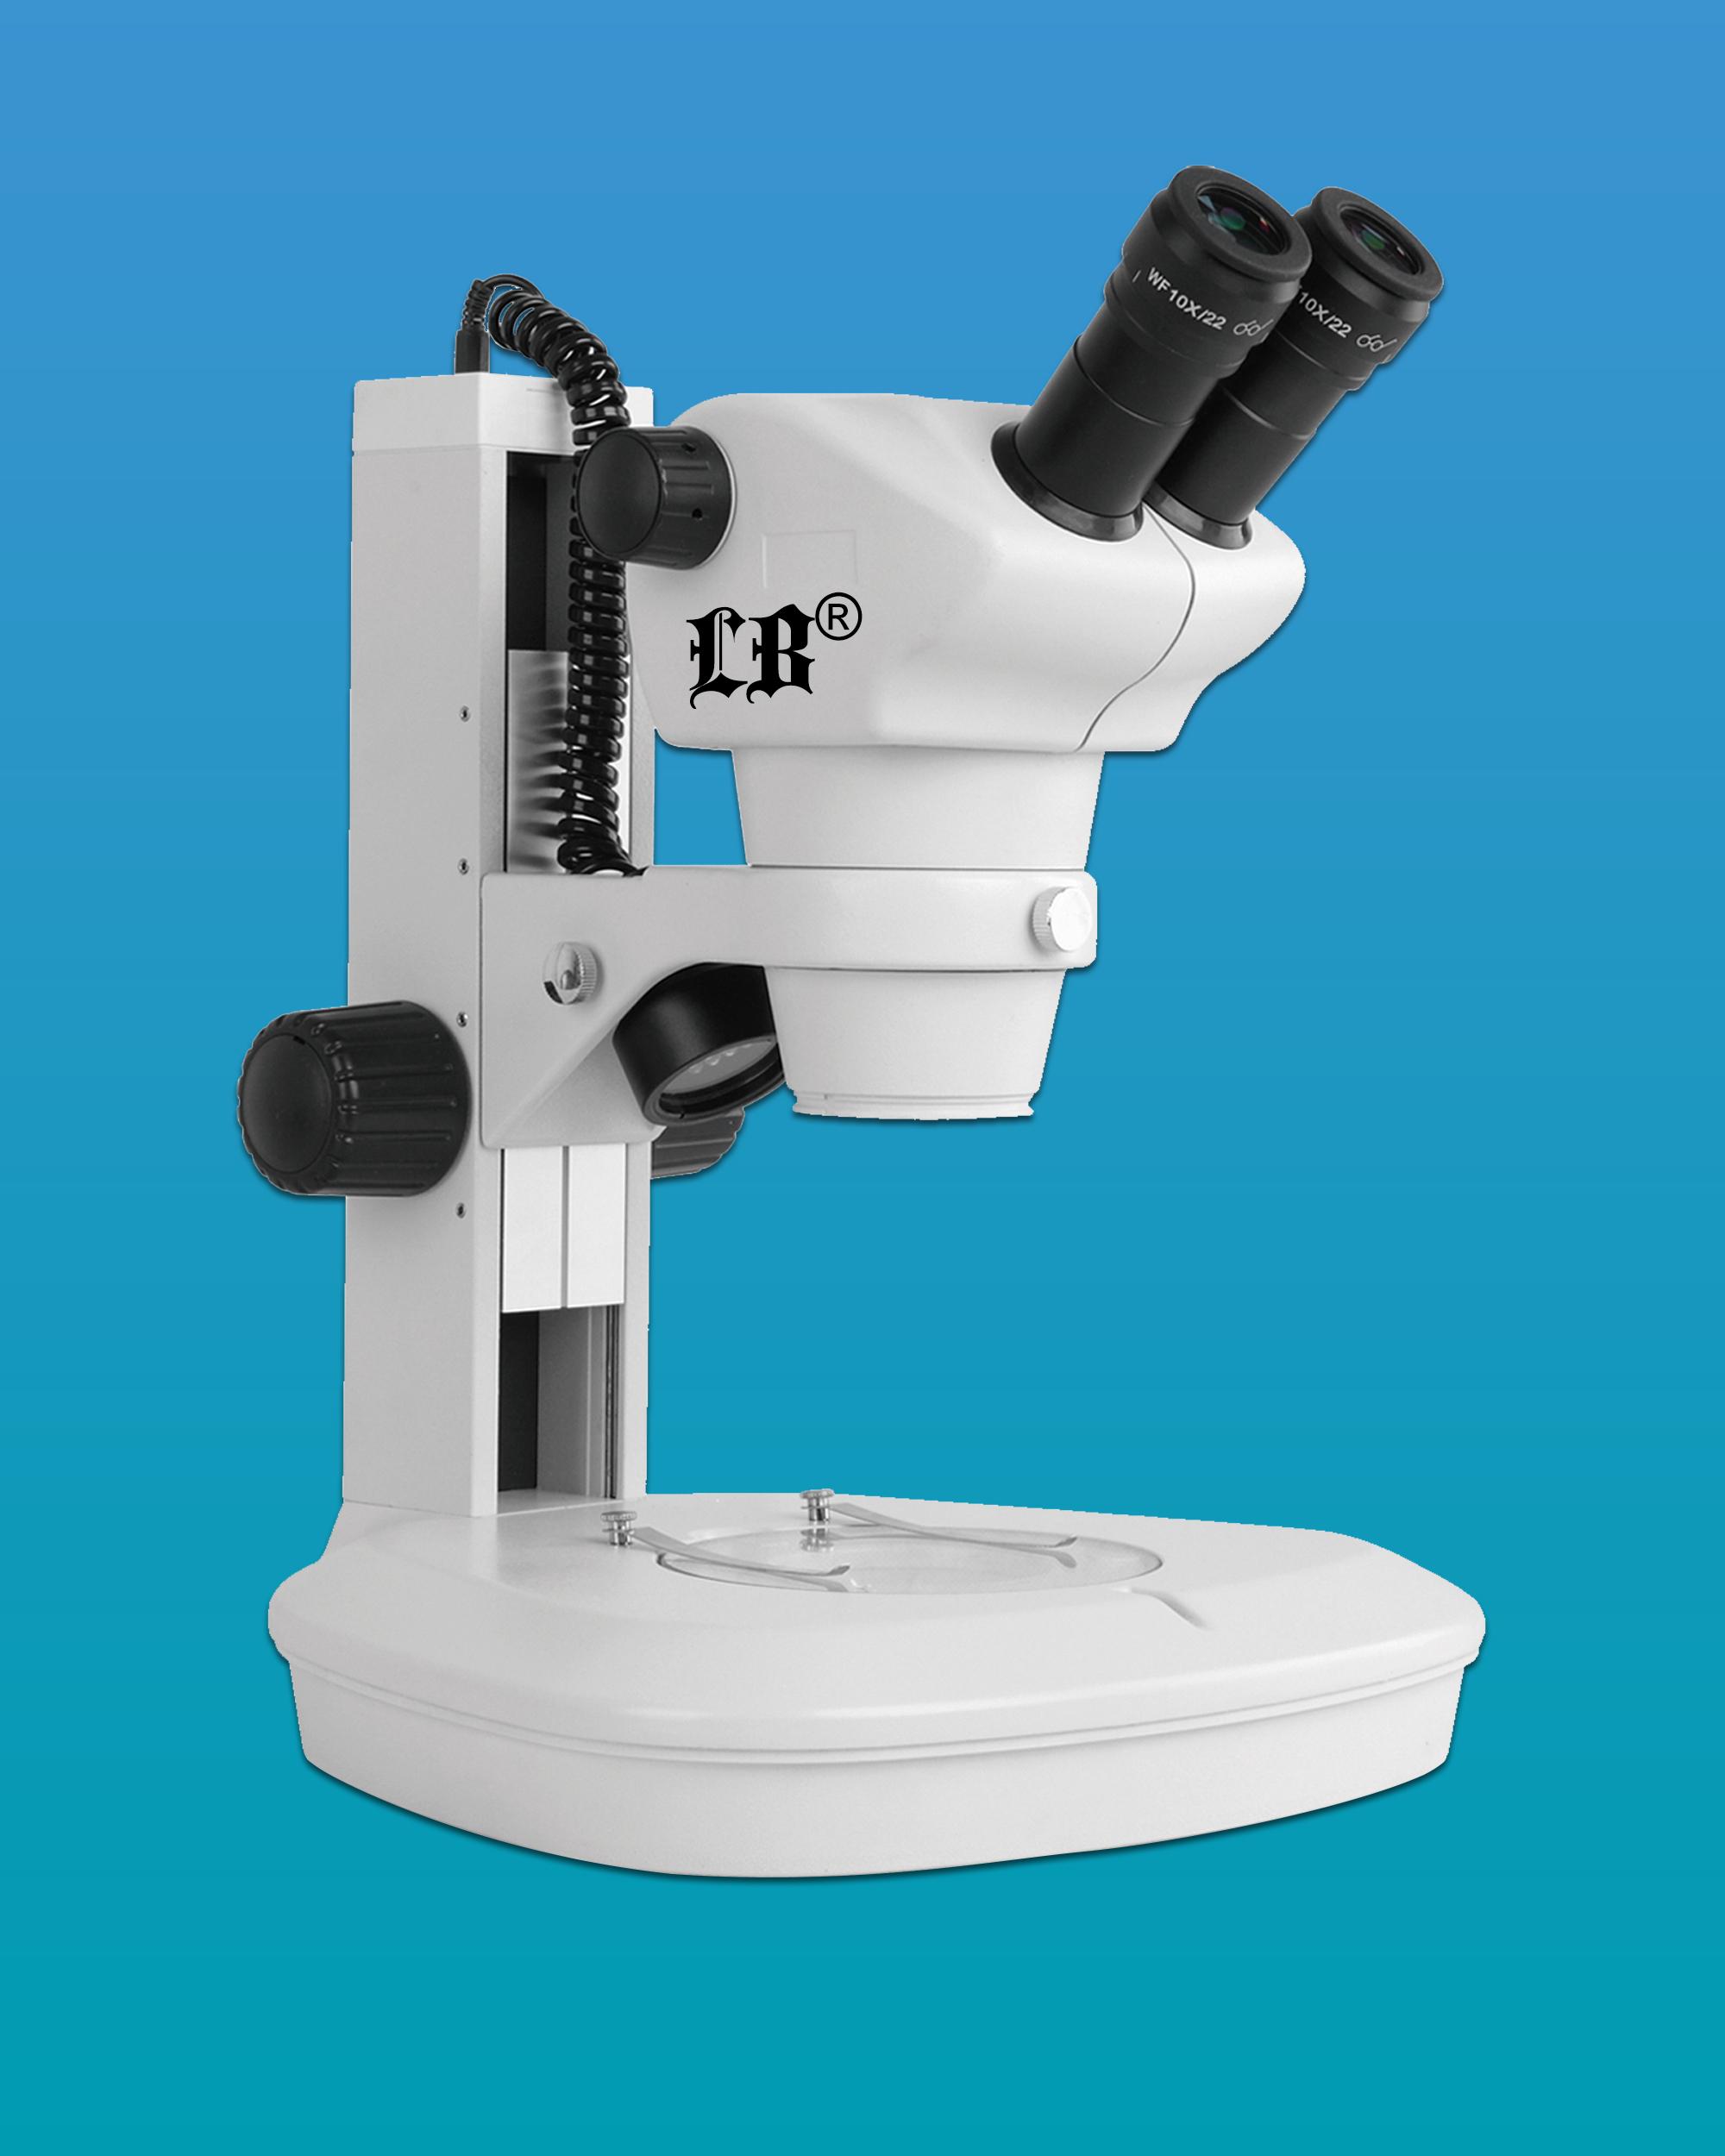 [LB-335] Zoom Binocular Stereo Microscope